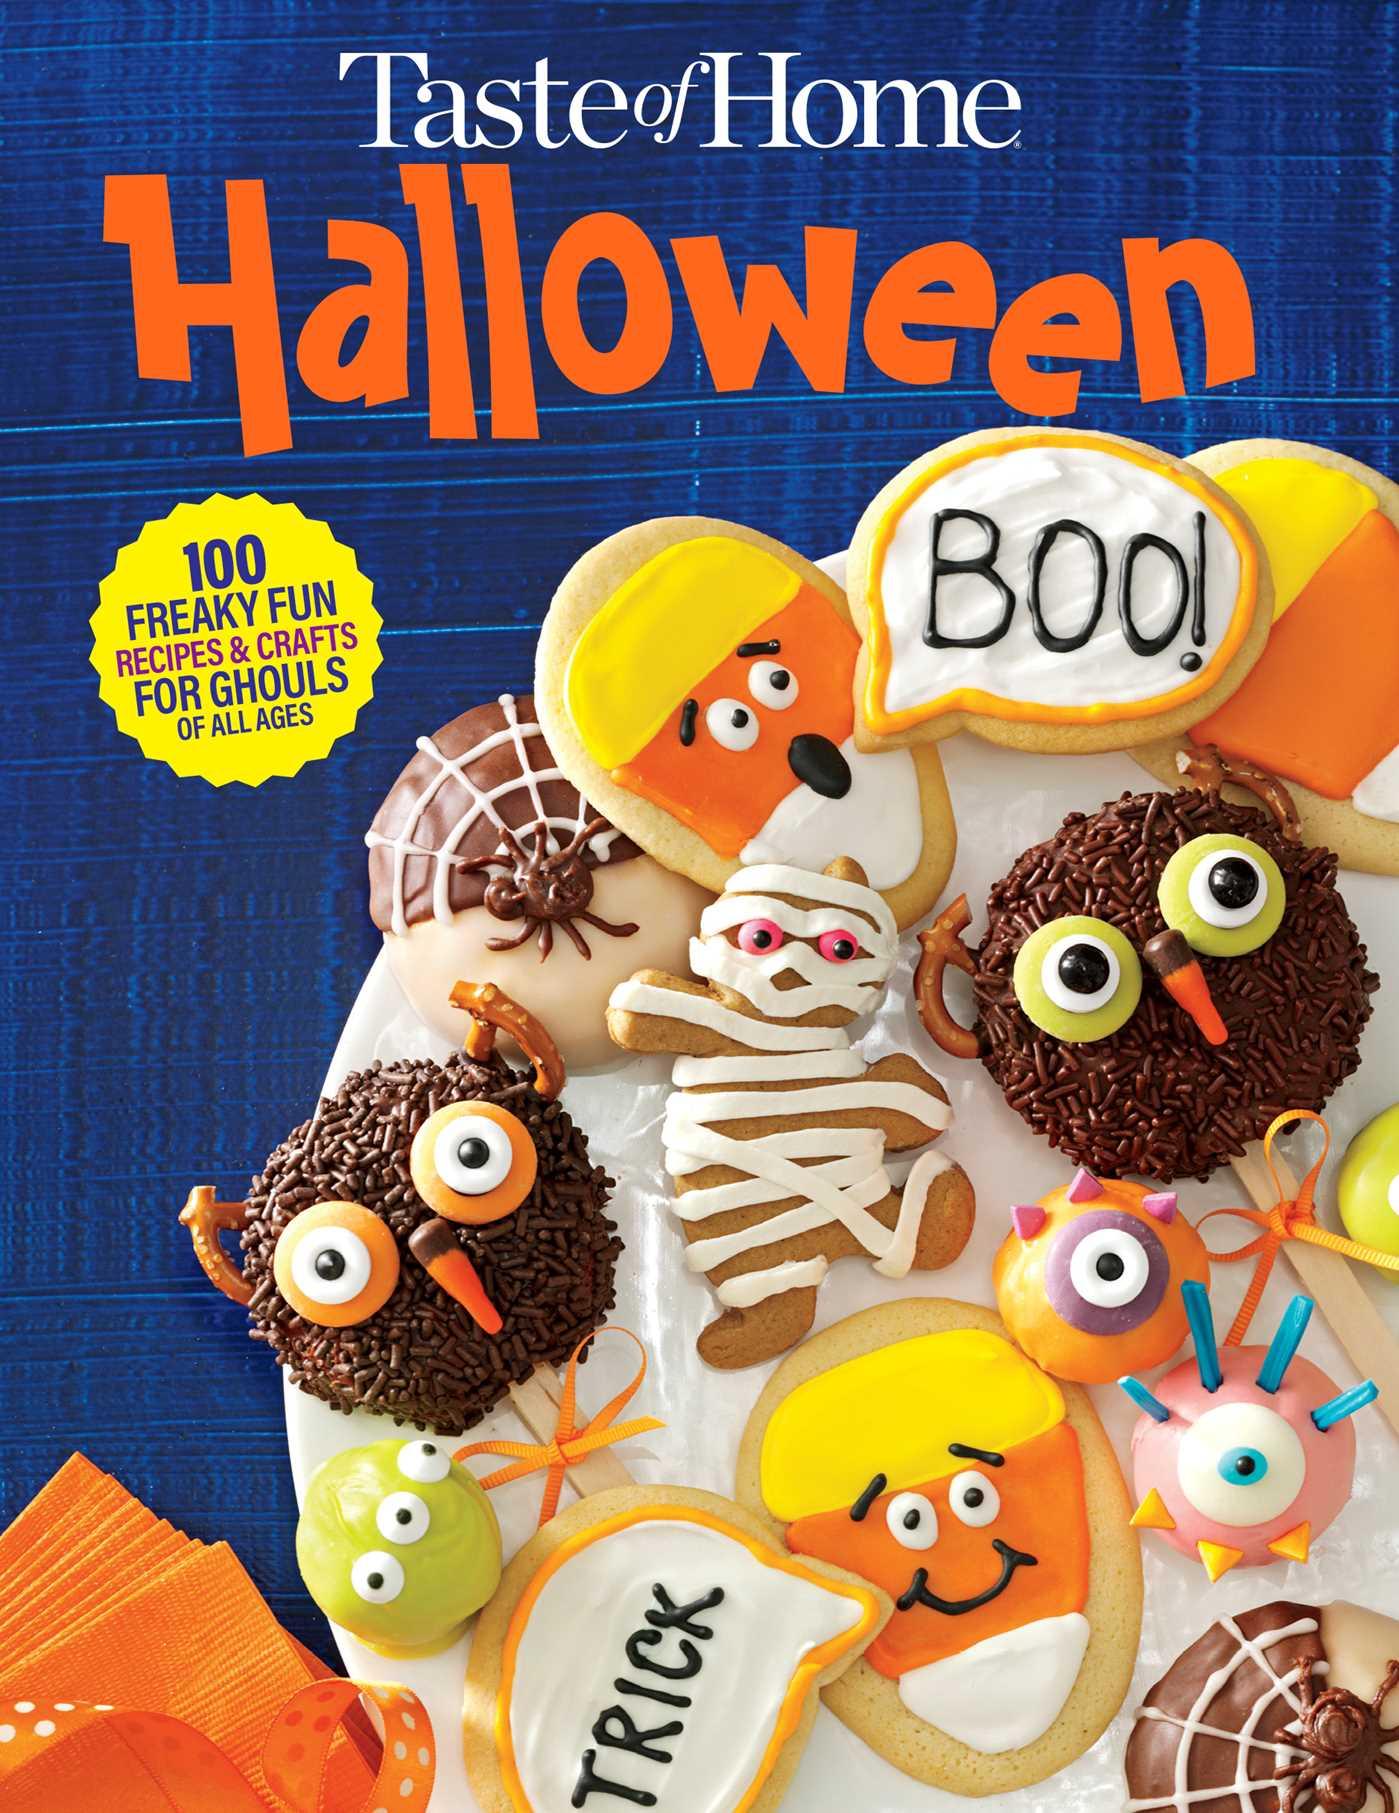 Taste of home halloween mini binder 9781617657689 hr